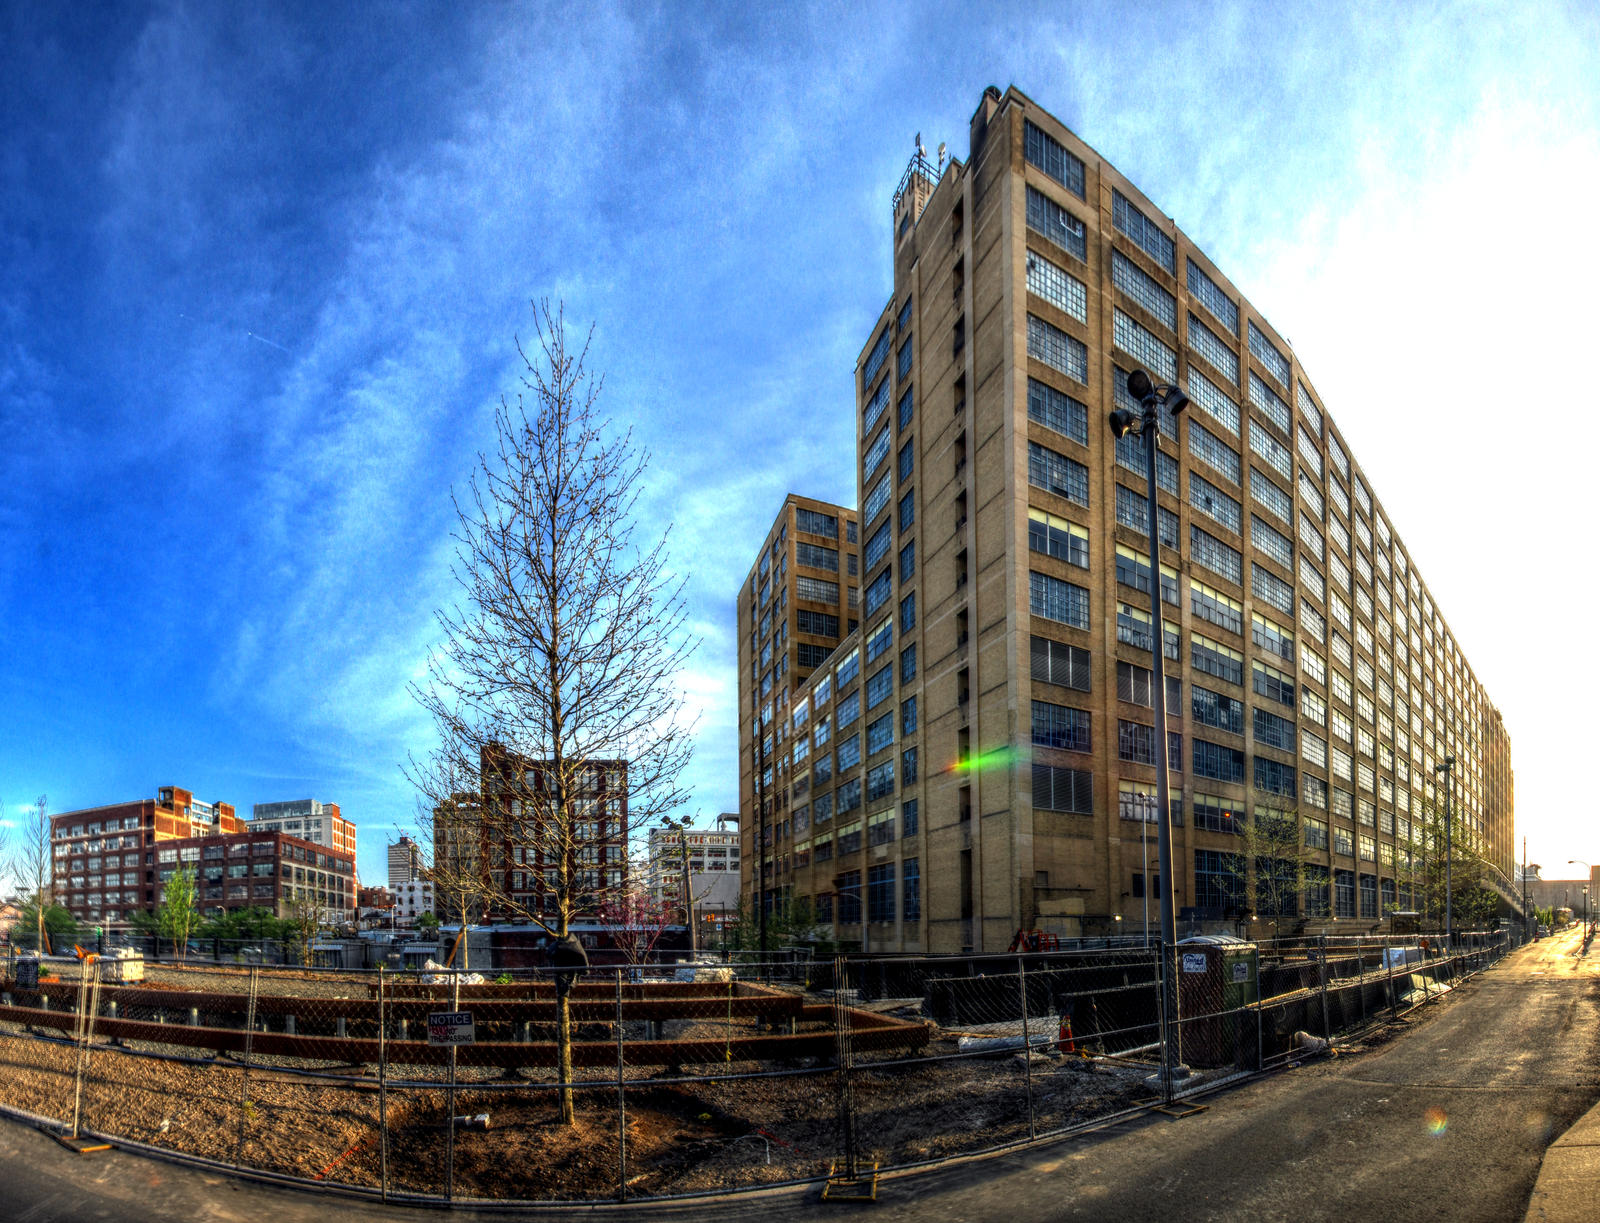 Panorama 3633 hdr pregamma 1 mantiuk06 contrast ma